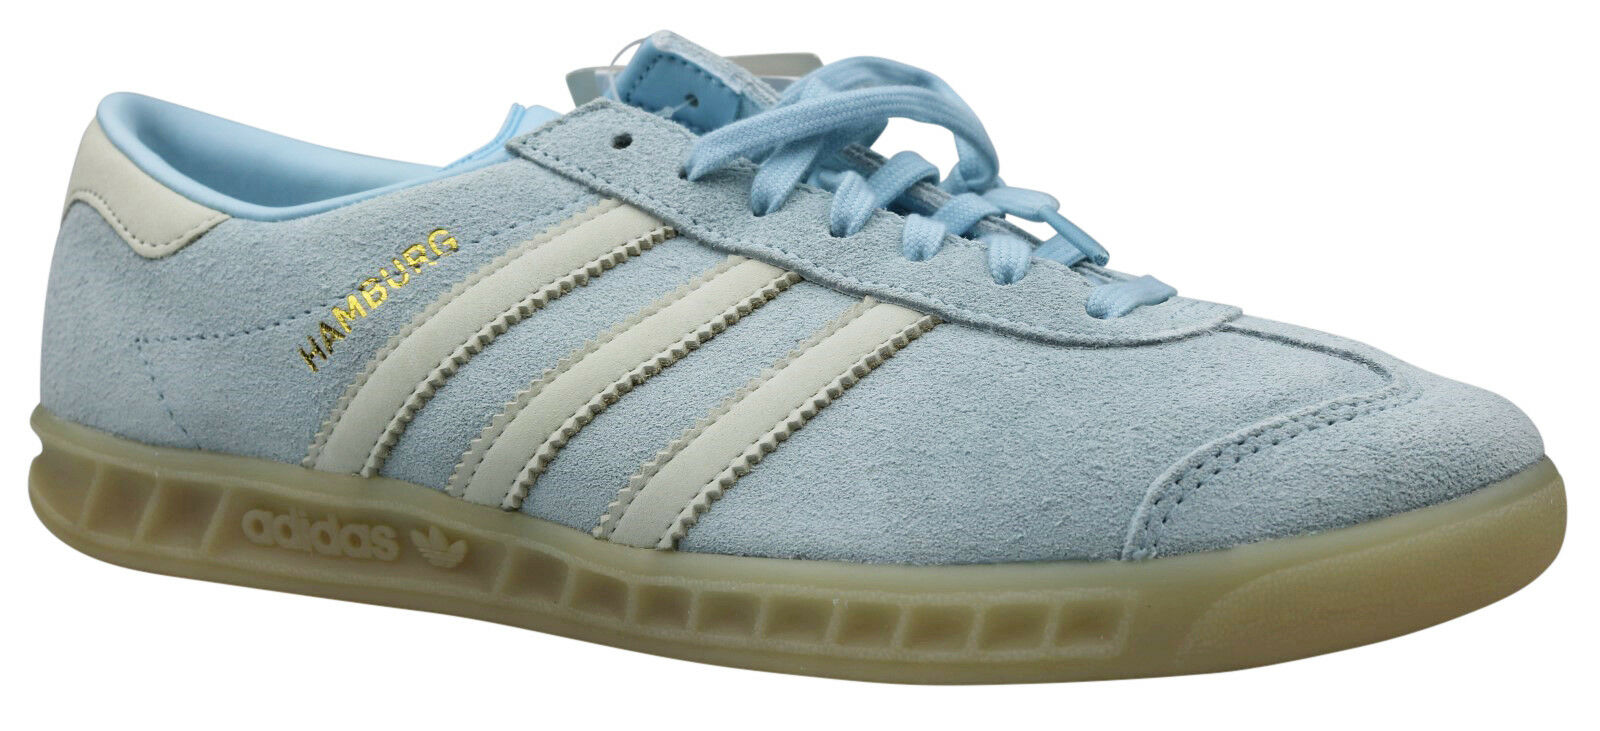 Adidas Originals Hamburg W Damen Turnschuhe Schuhe blau BA8410 Gr. 36 2 3 & 38 NEU